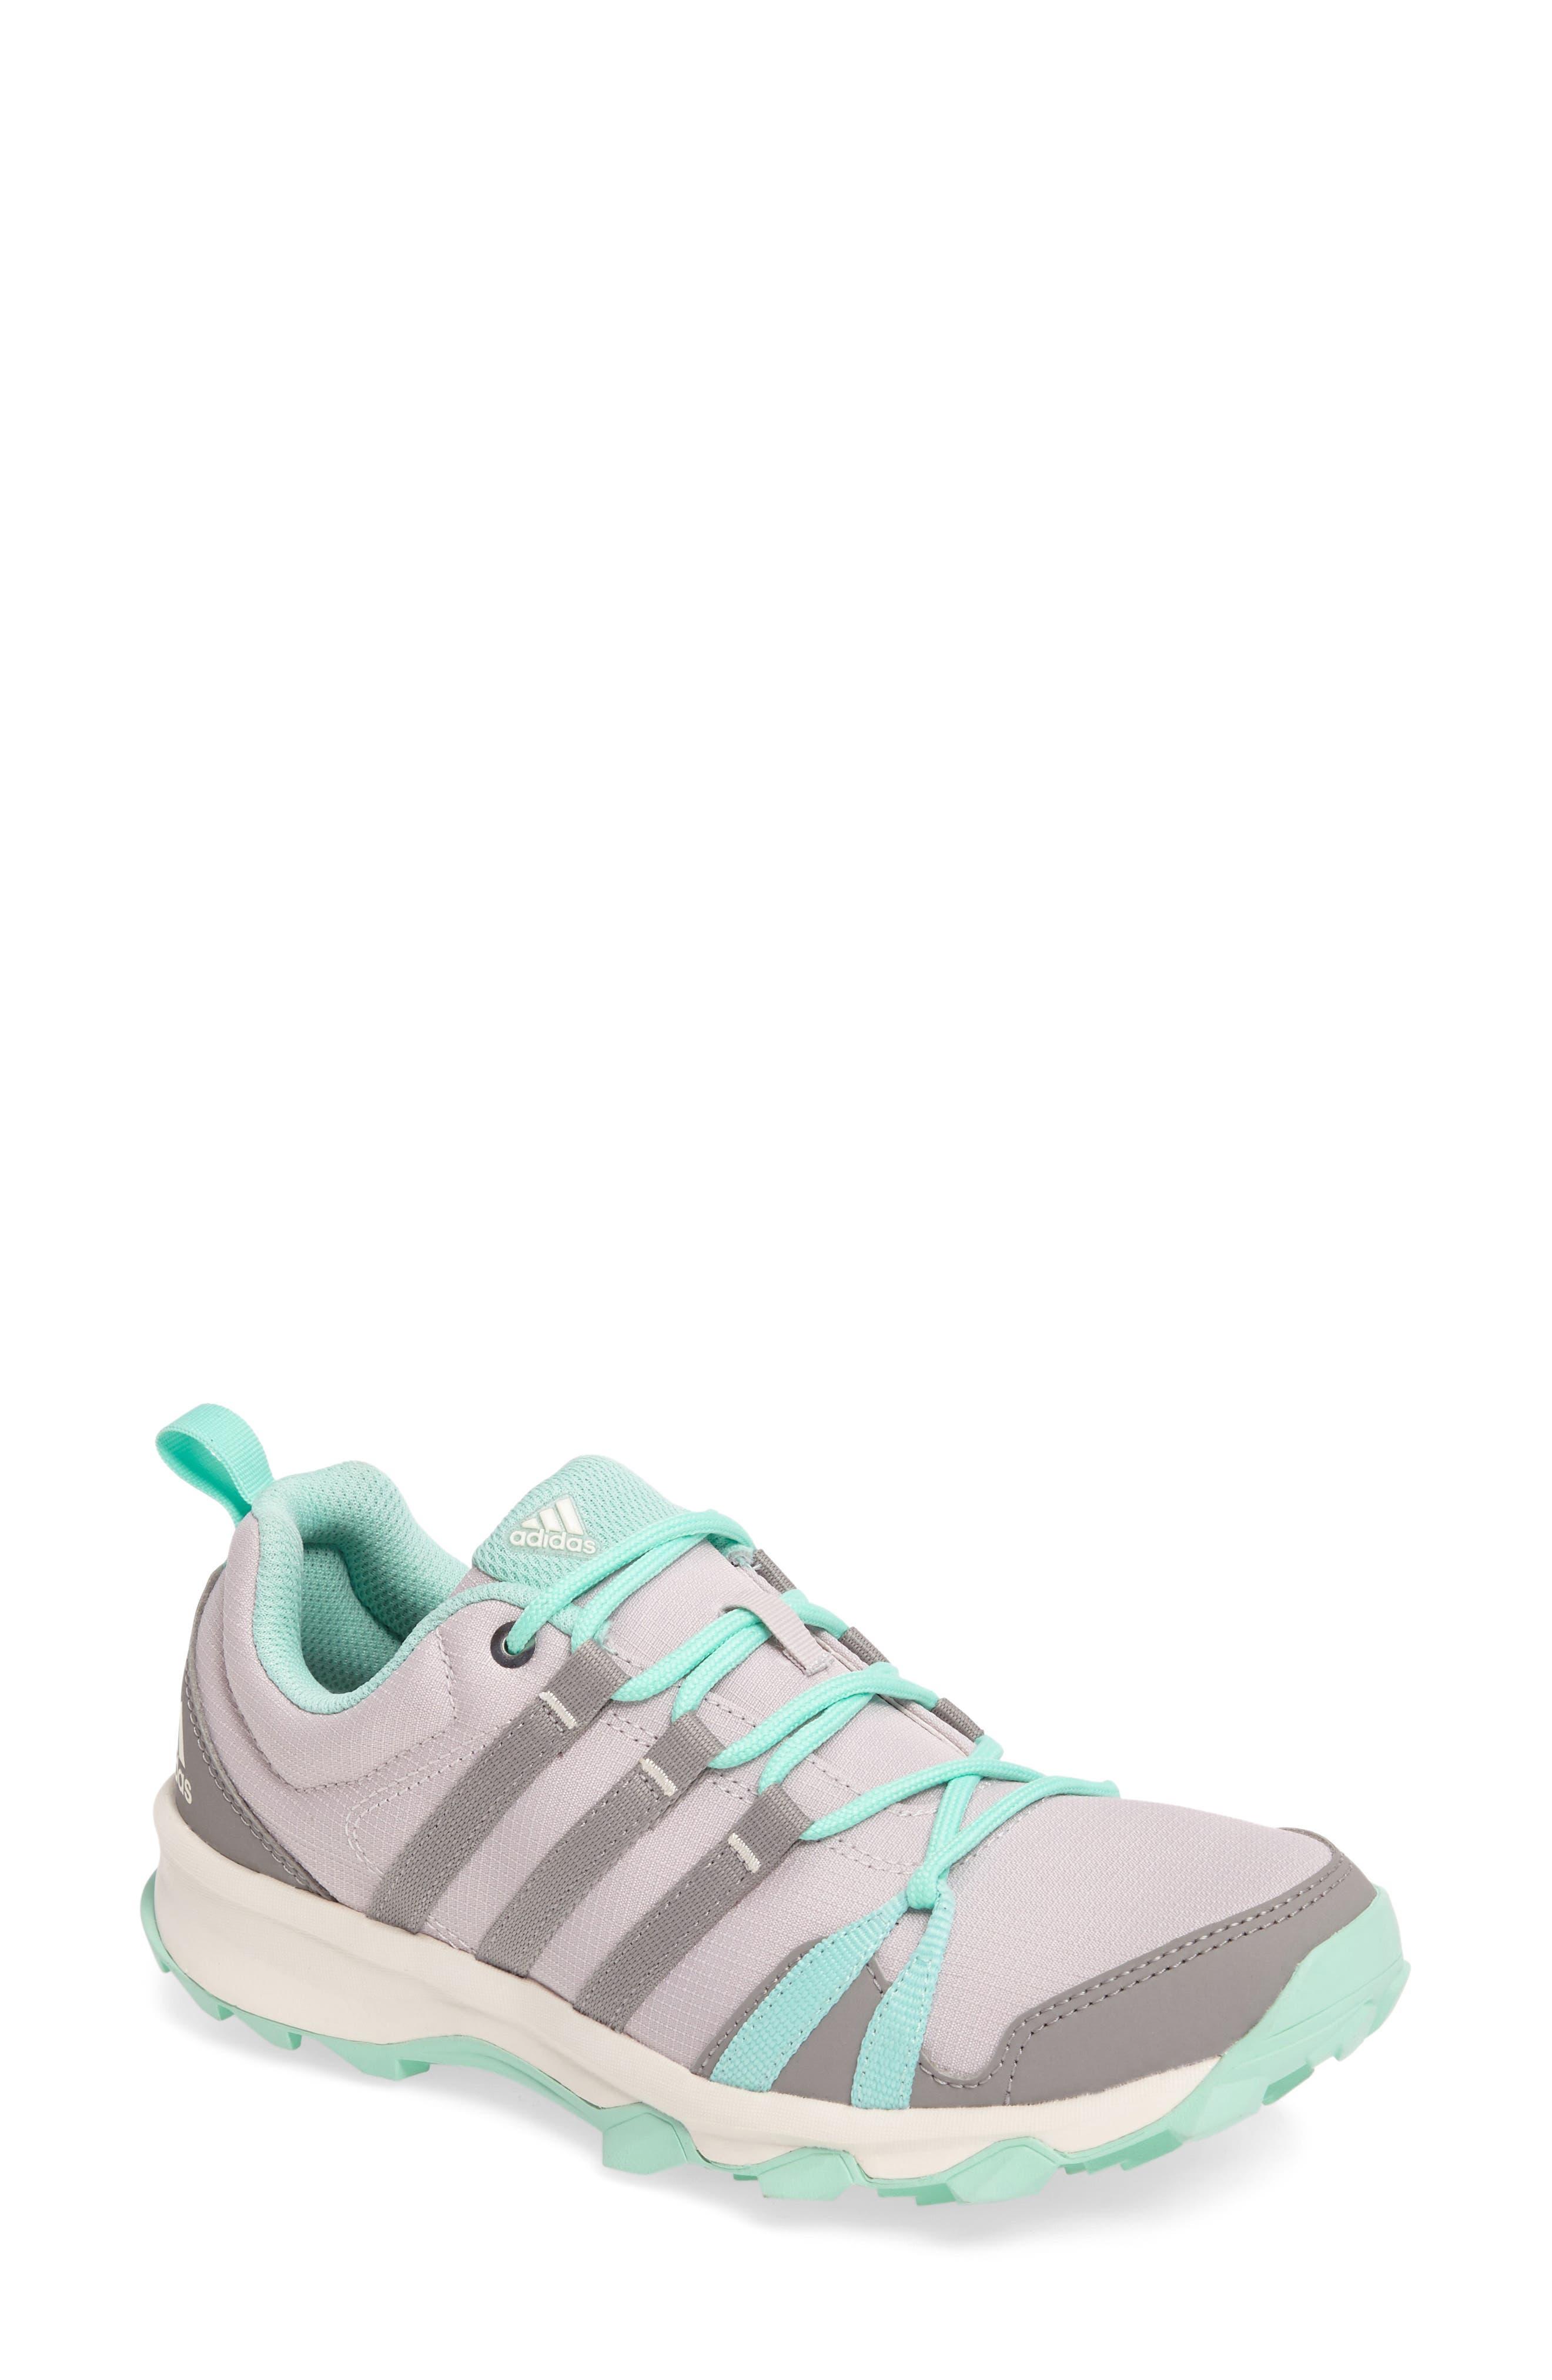 Main Image - adidas 'Tracerocker' Athletic Sneaker (Women)